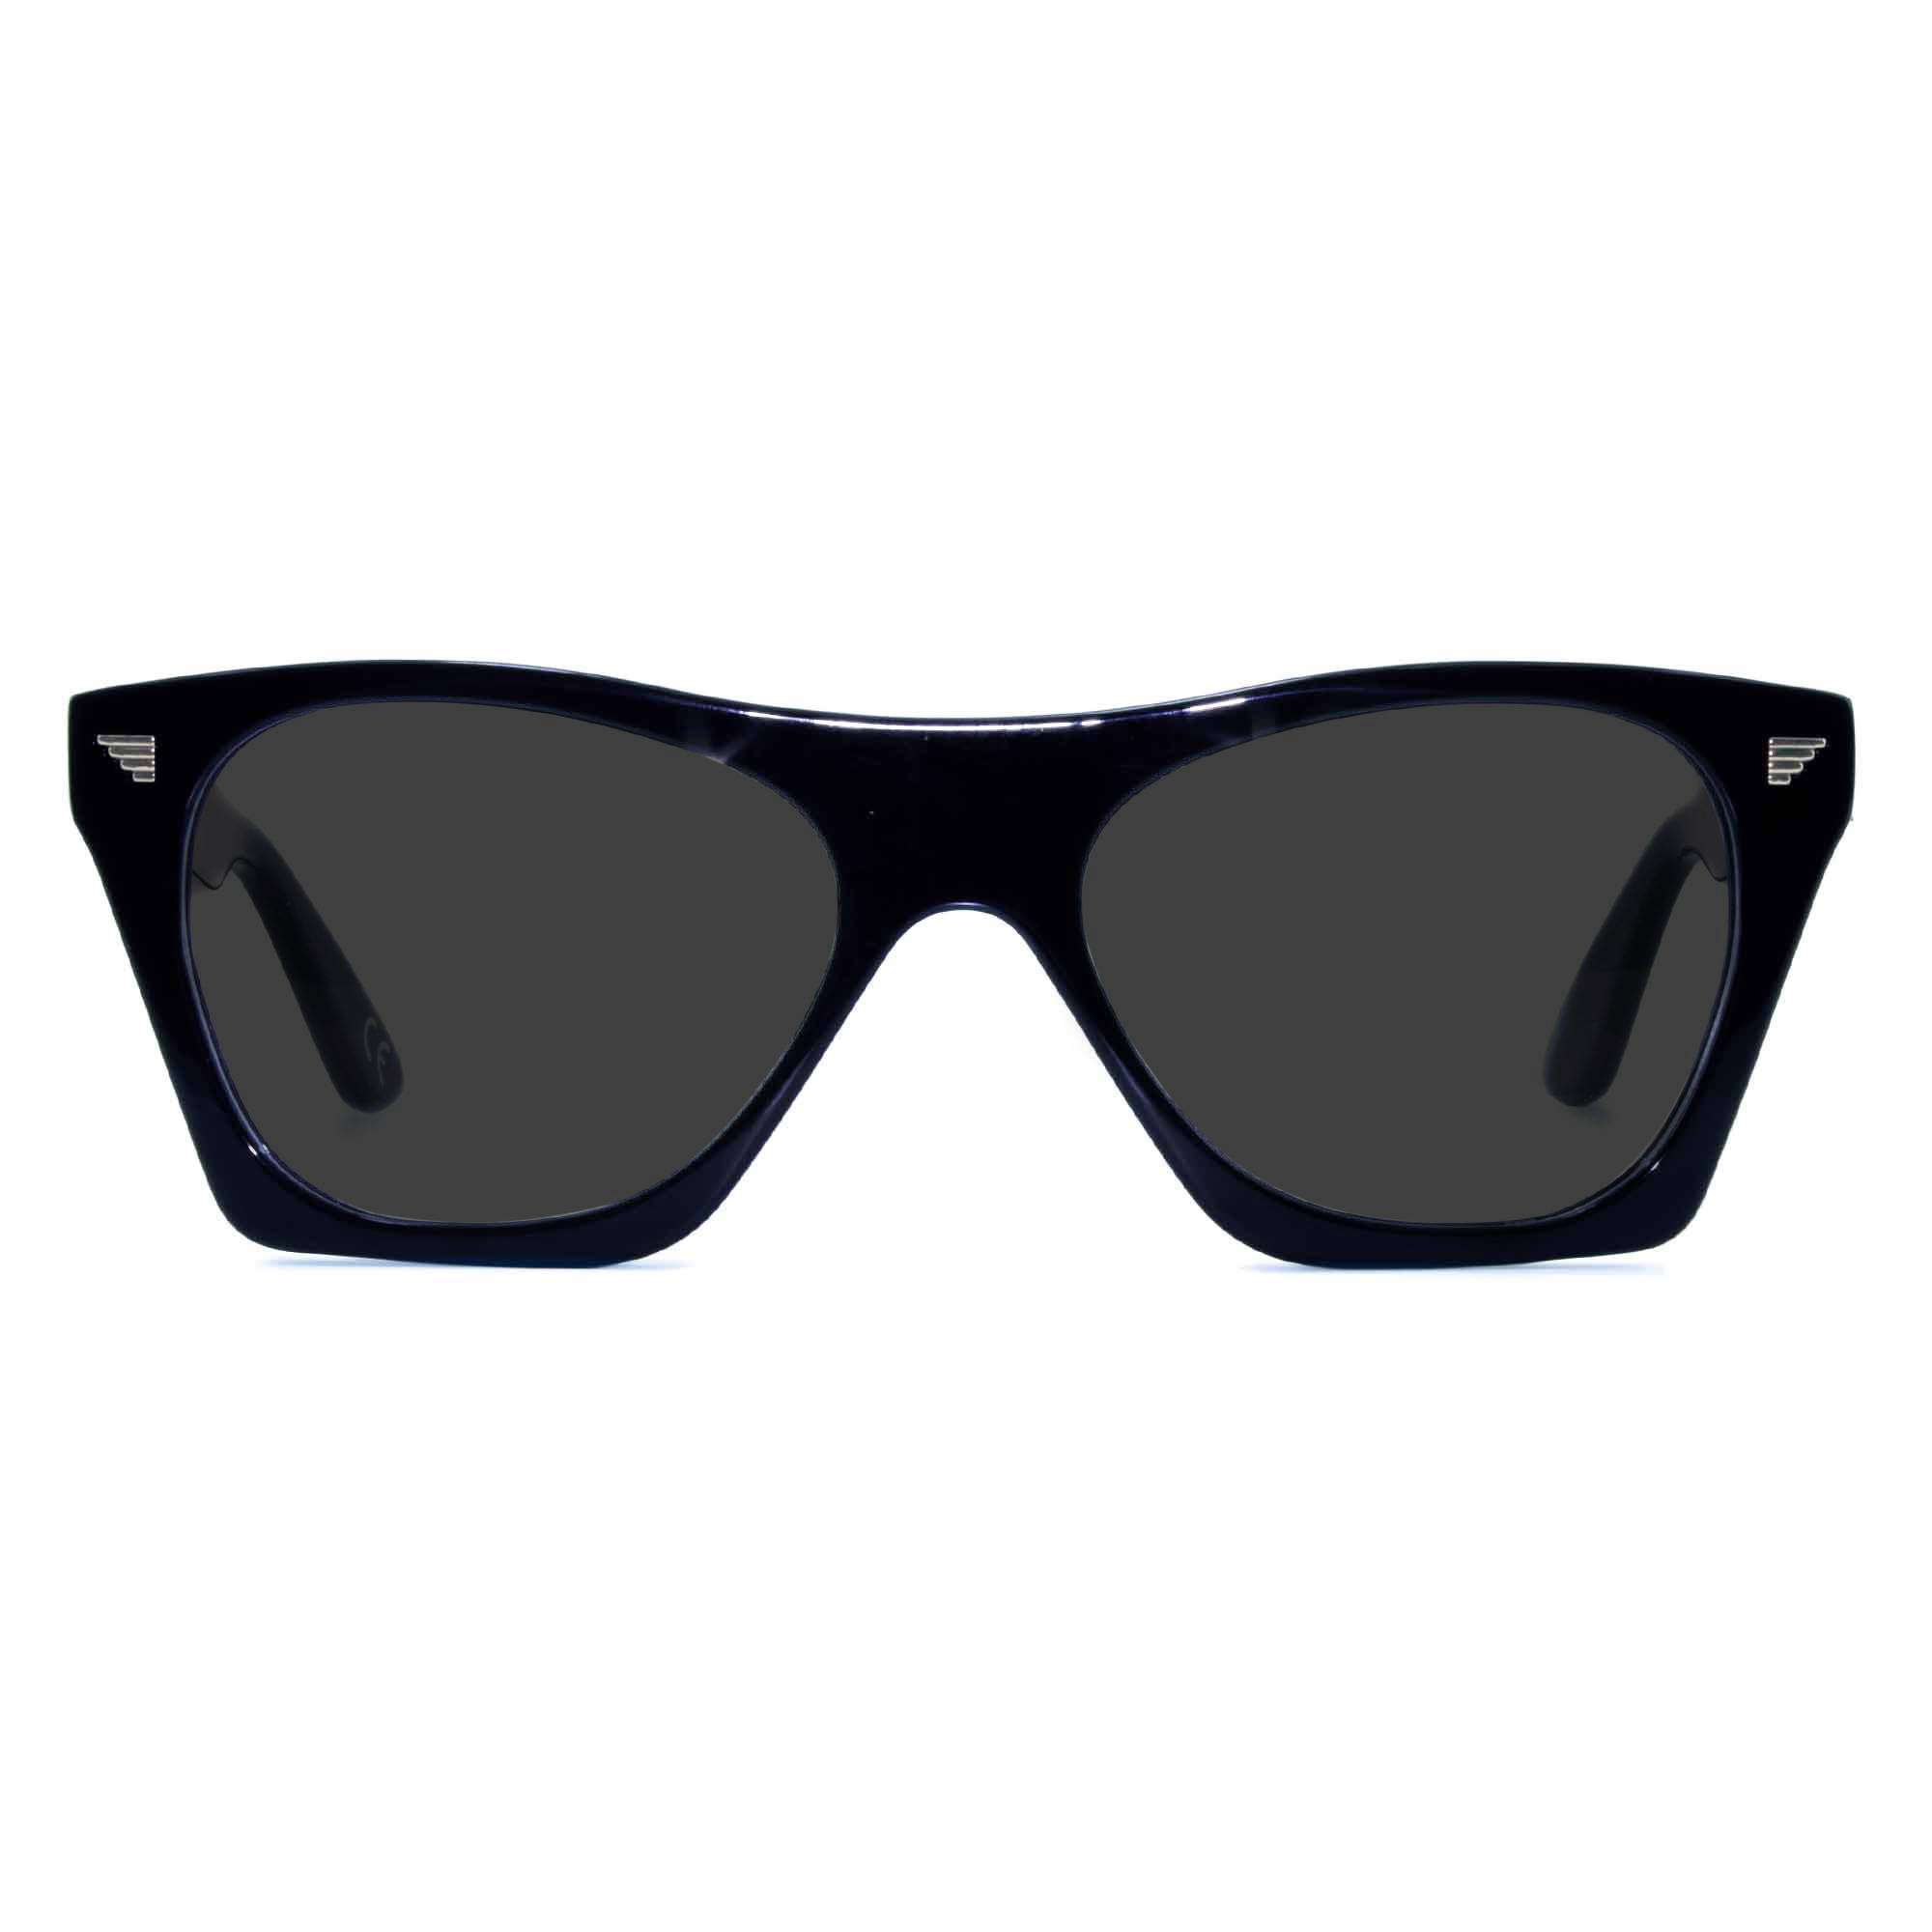 Joiuss oscar black sunglasses